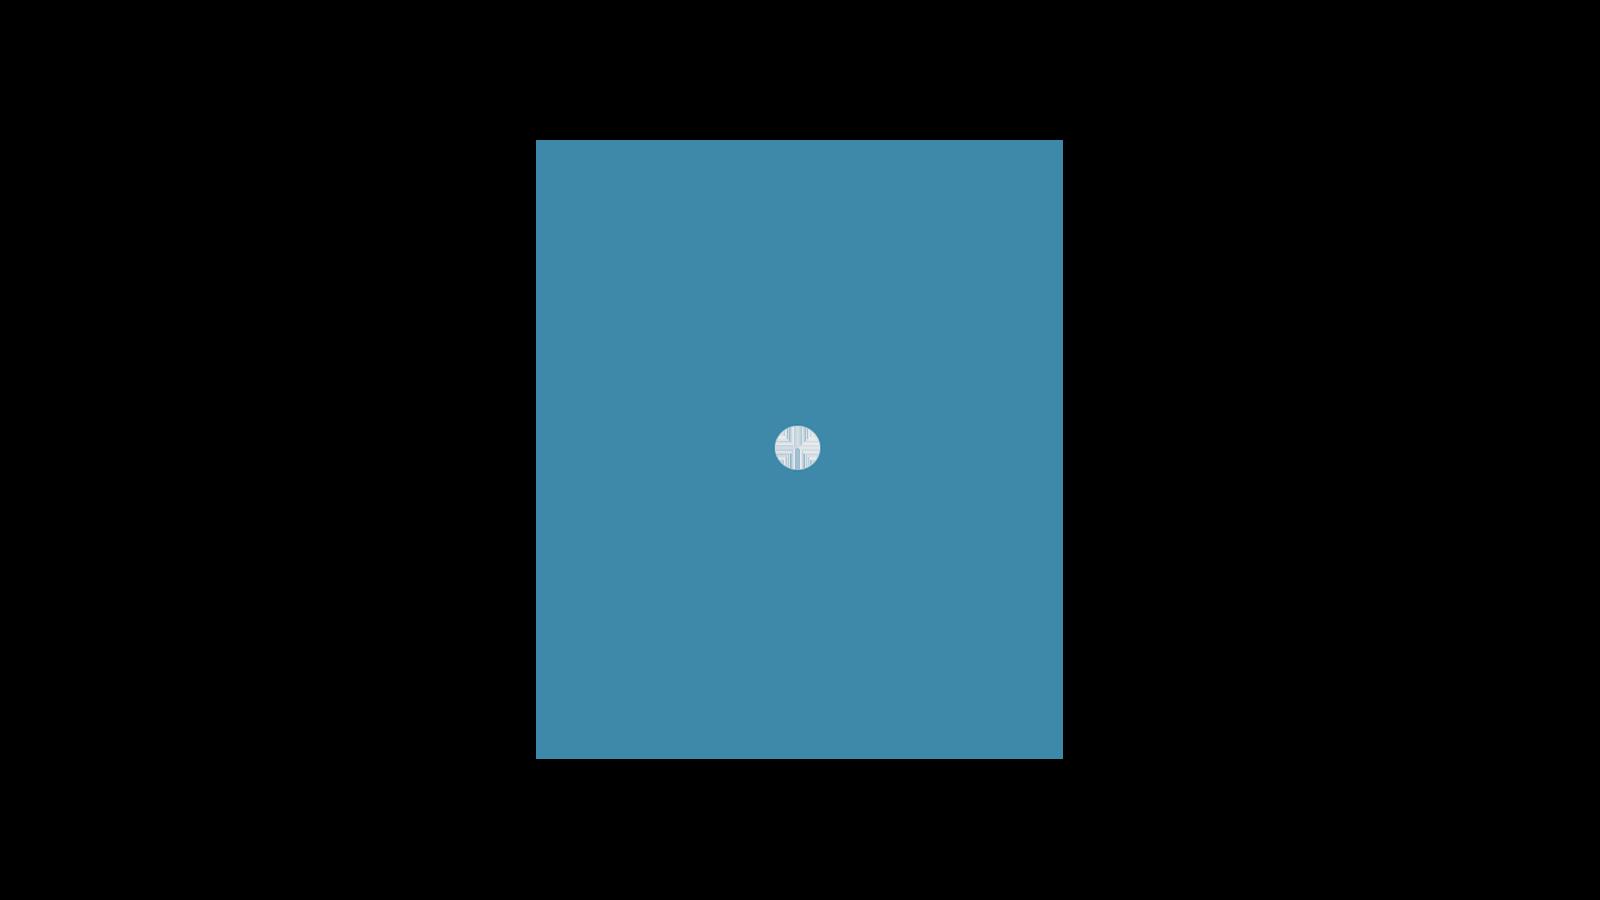 Man has virtual consultation about gaining an artificial eye